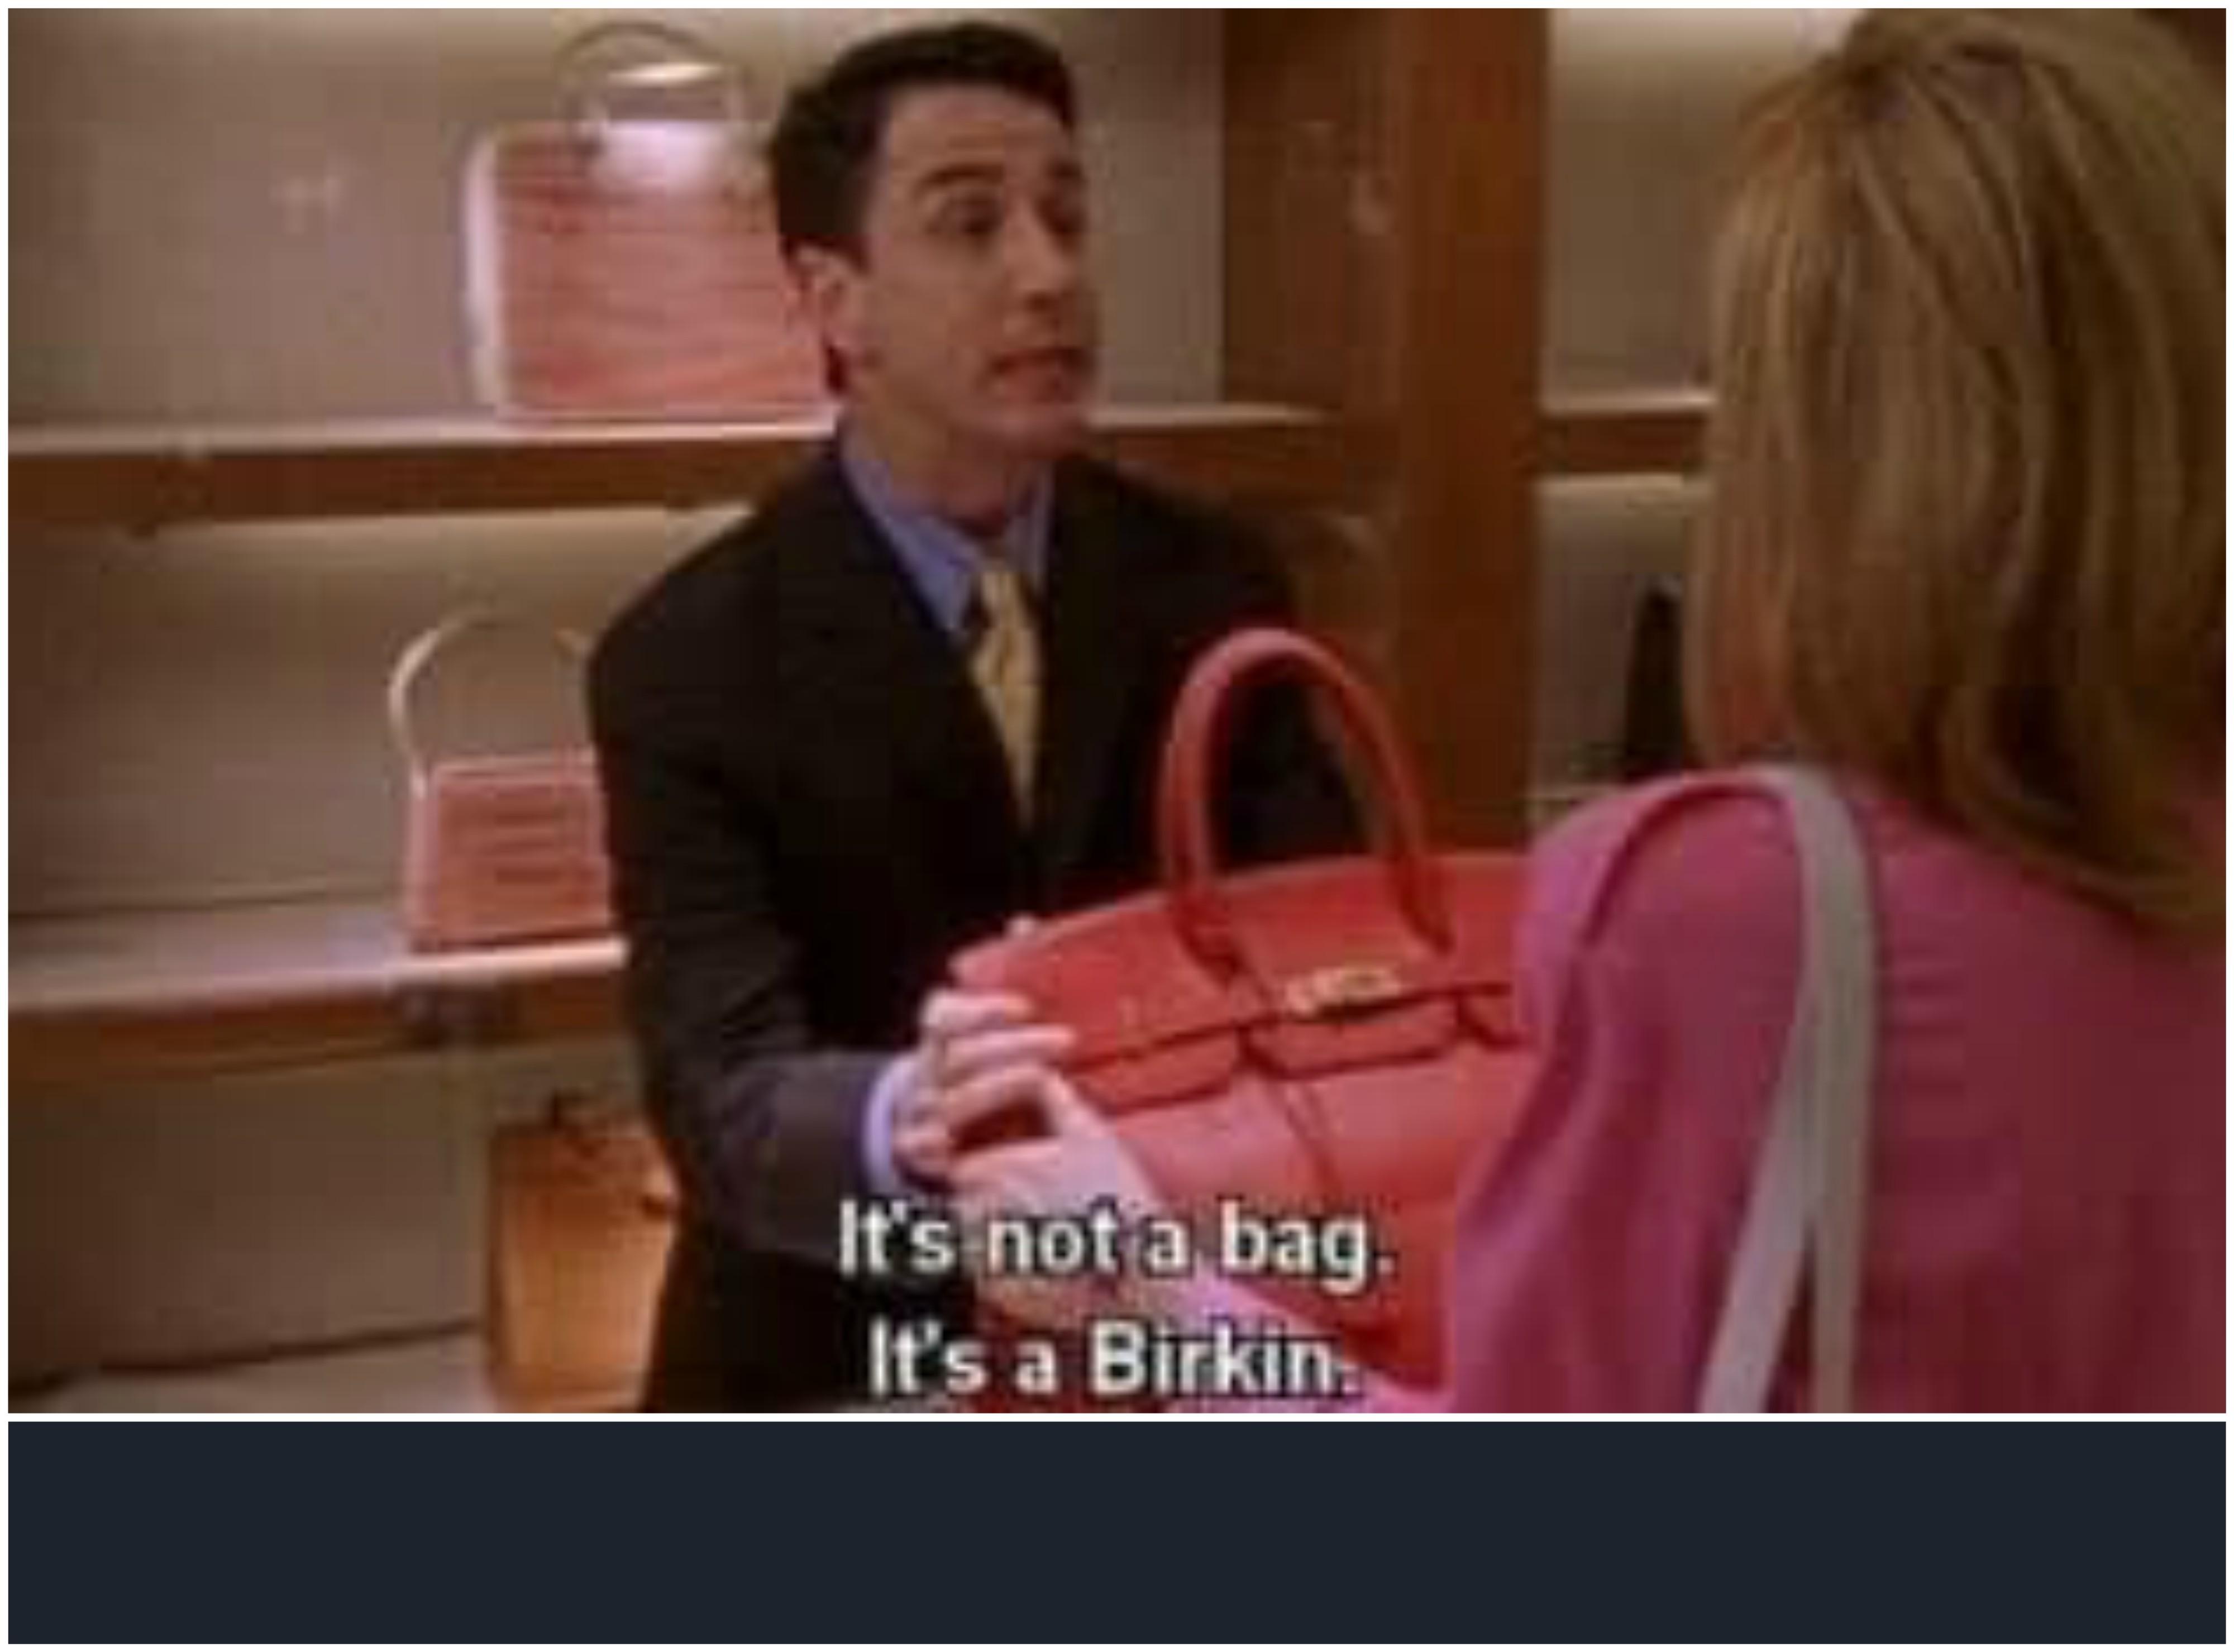 Its-not-a-bag-its-a-birking